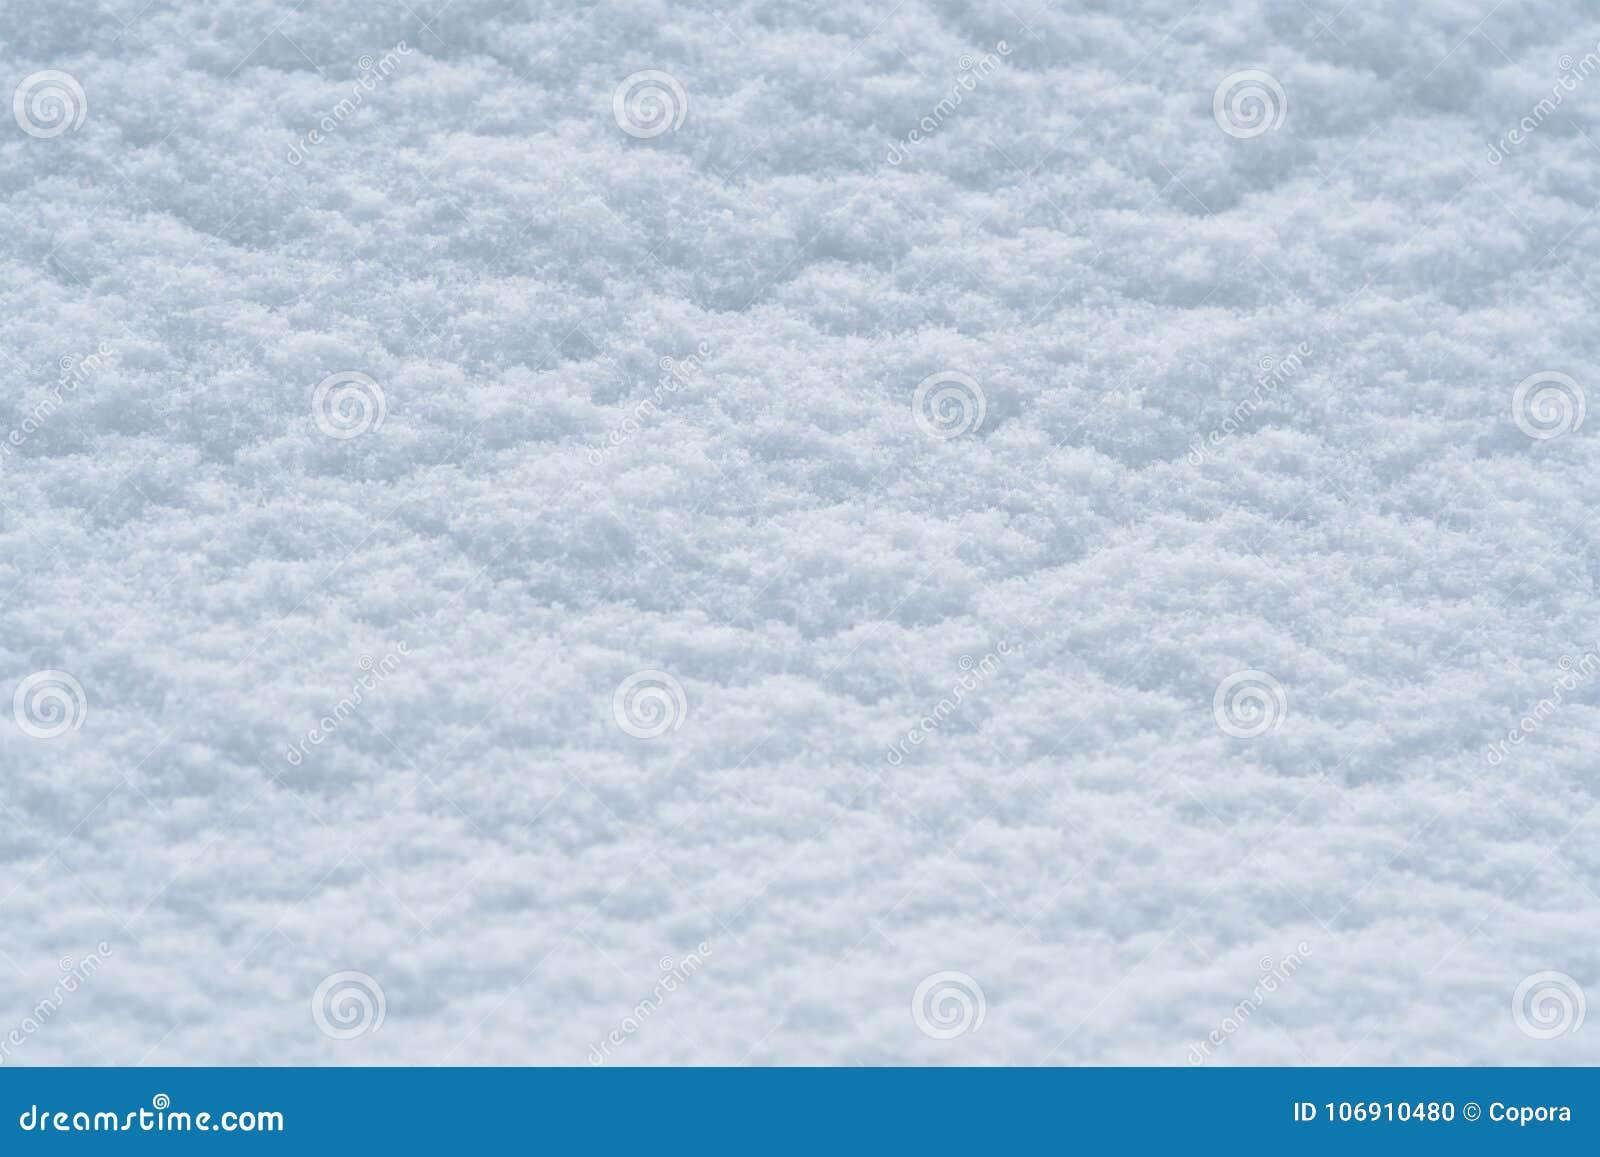 Tło śnieżna tekstura w błękitnym brzmieniu